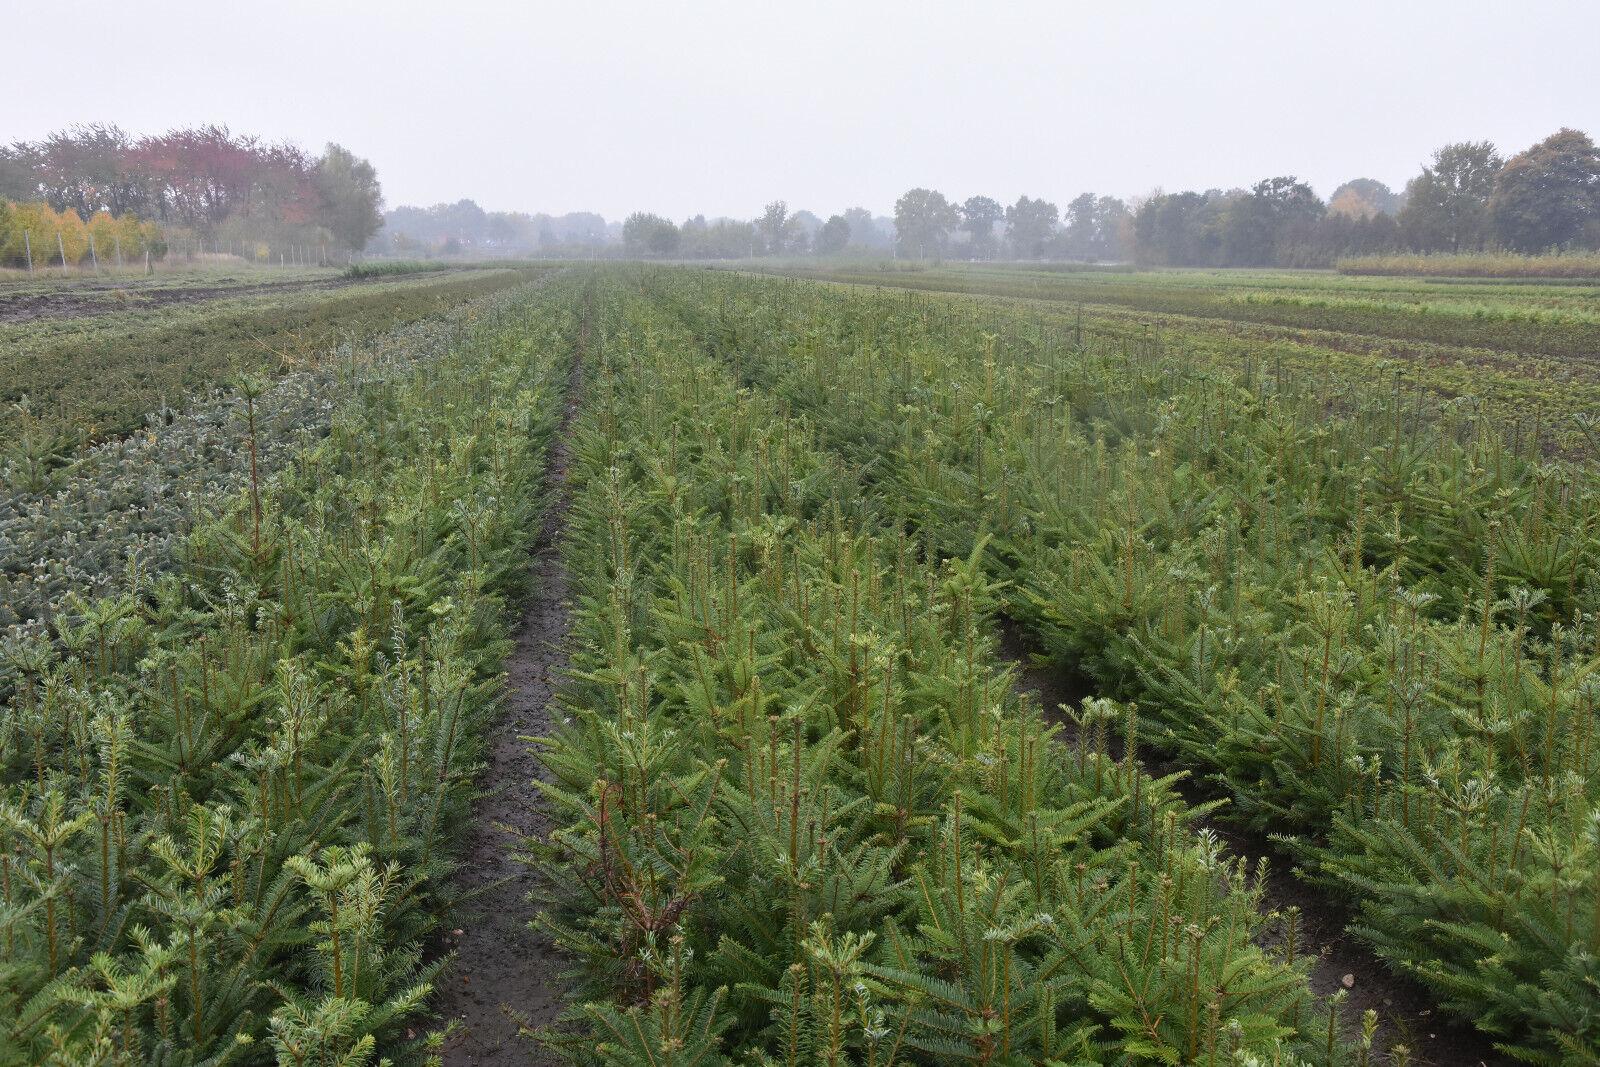 Omorika Fichte Picea omorika 100st. 30-60cm Forstpflanzen Nadelgehölze